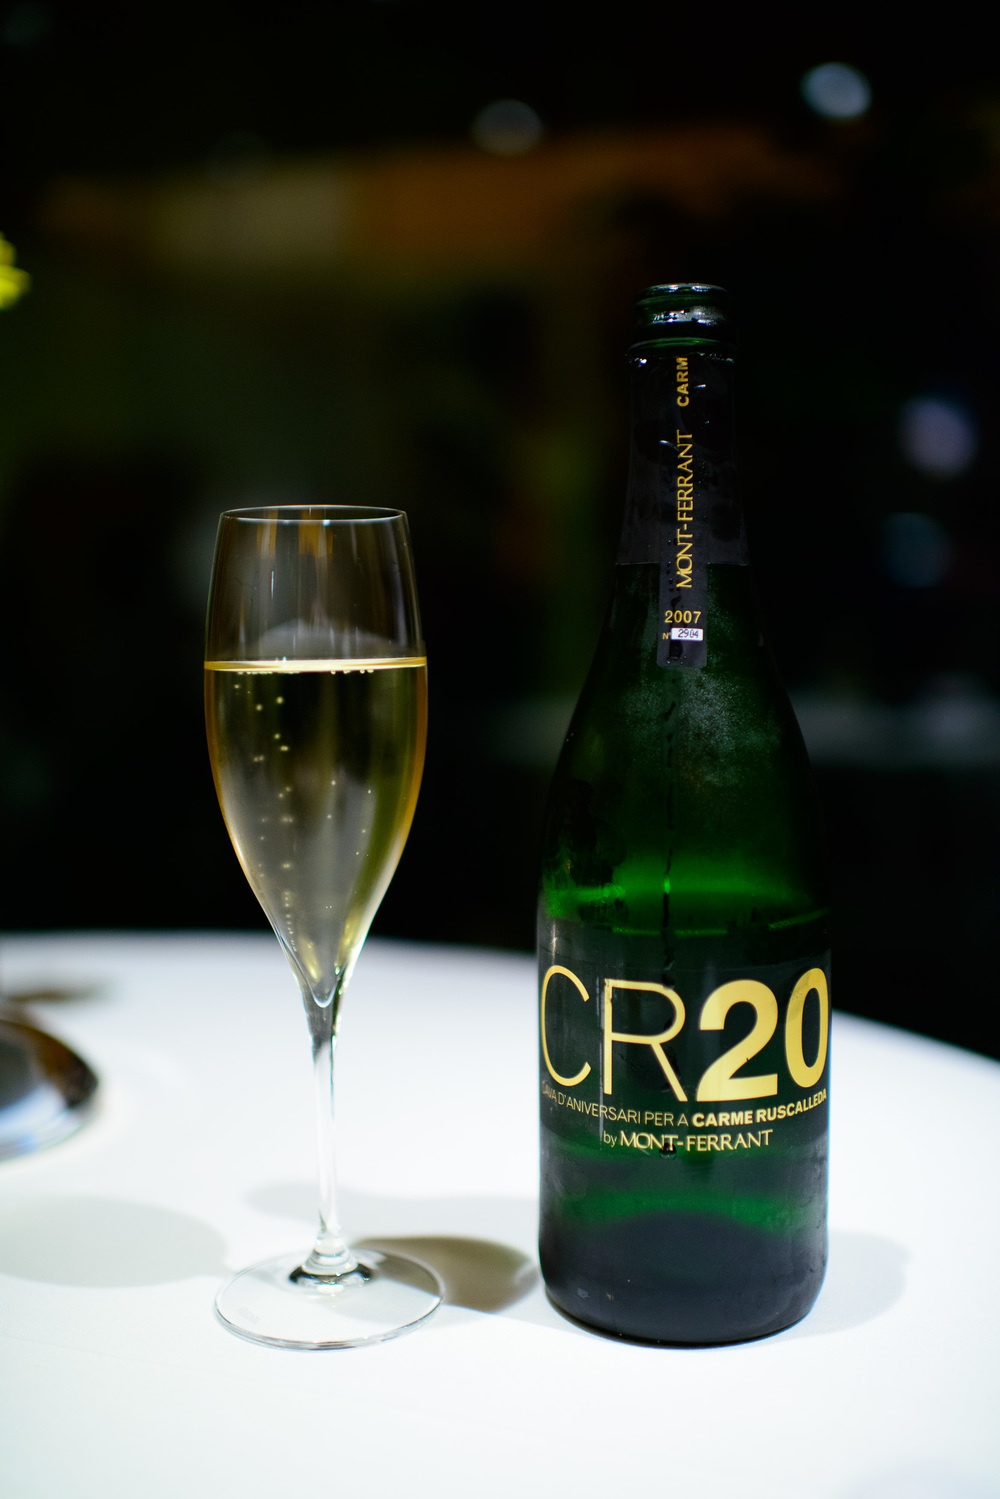 CR20 Cava